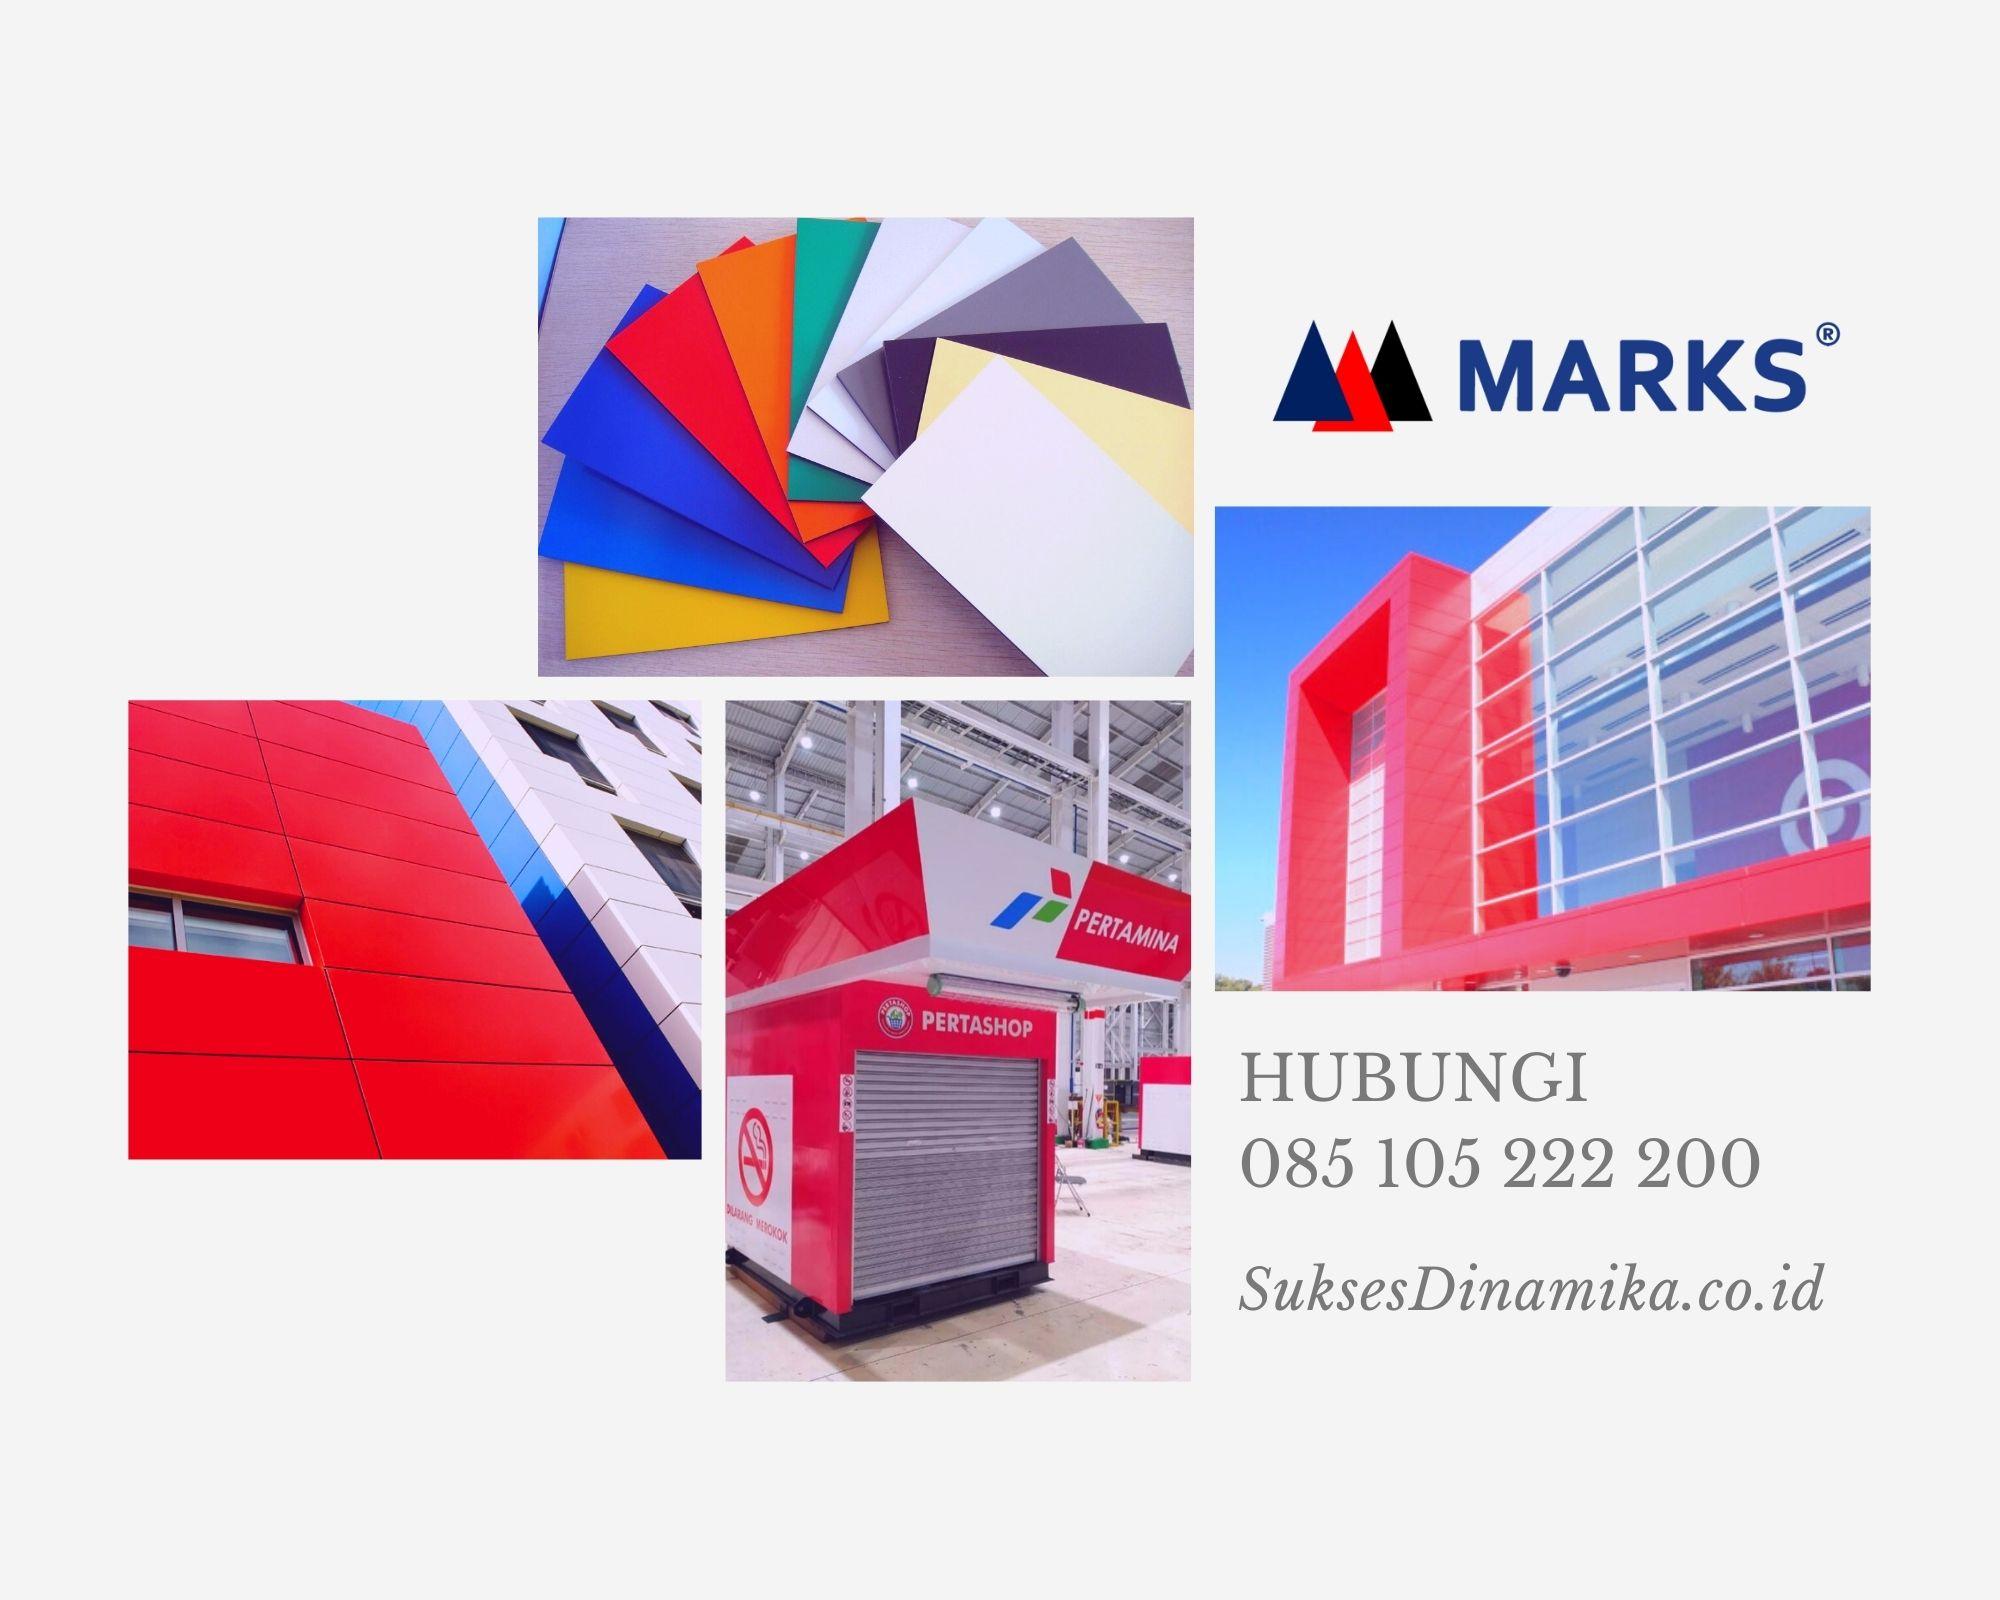 Harga Aluminium Composite Panel Marks Seven Surabaya